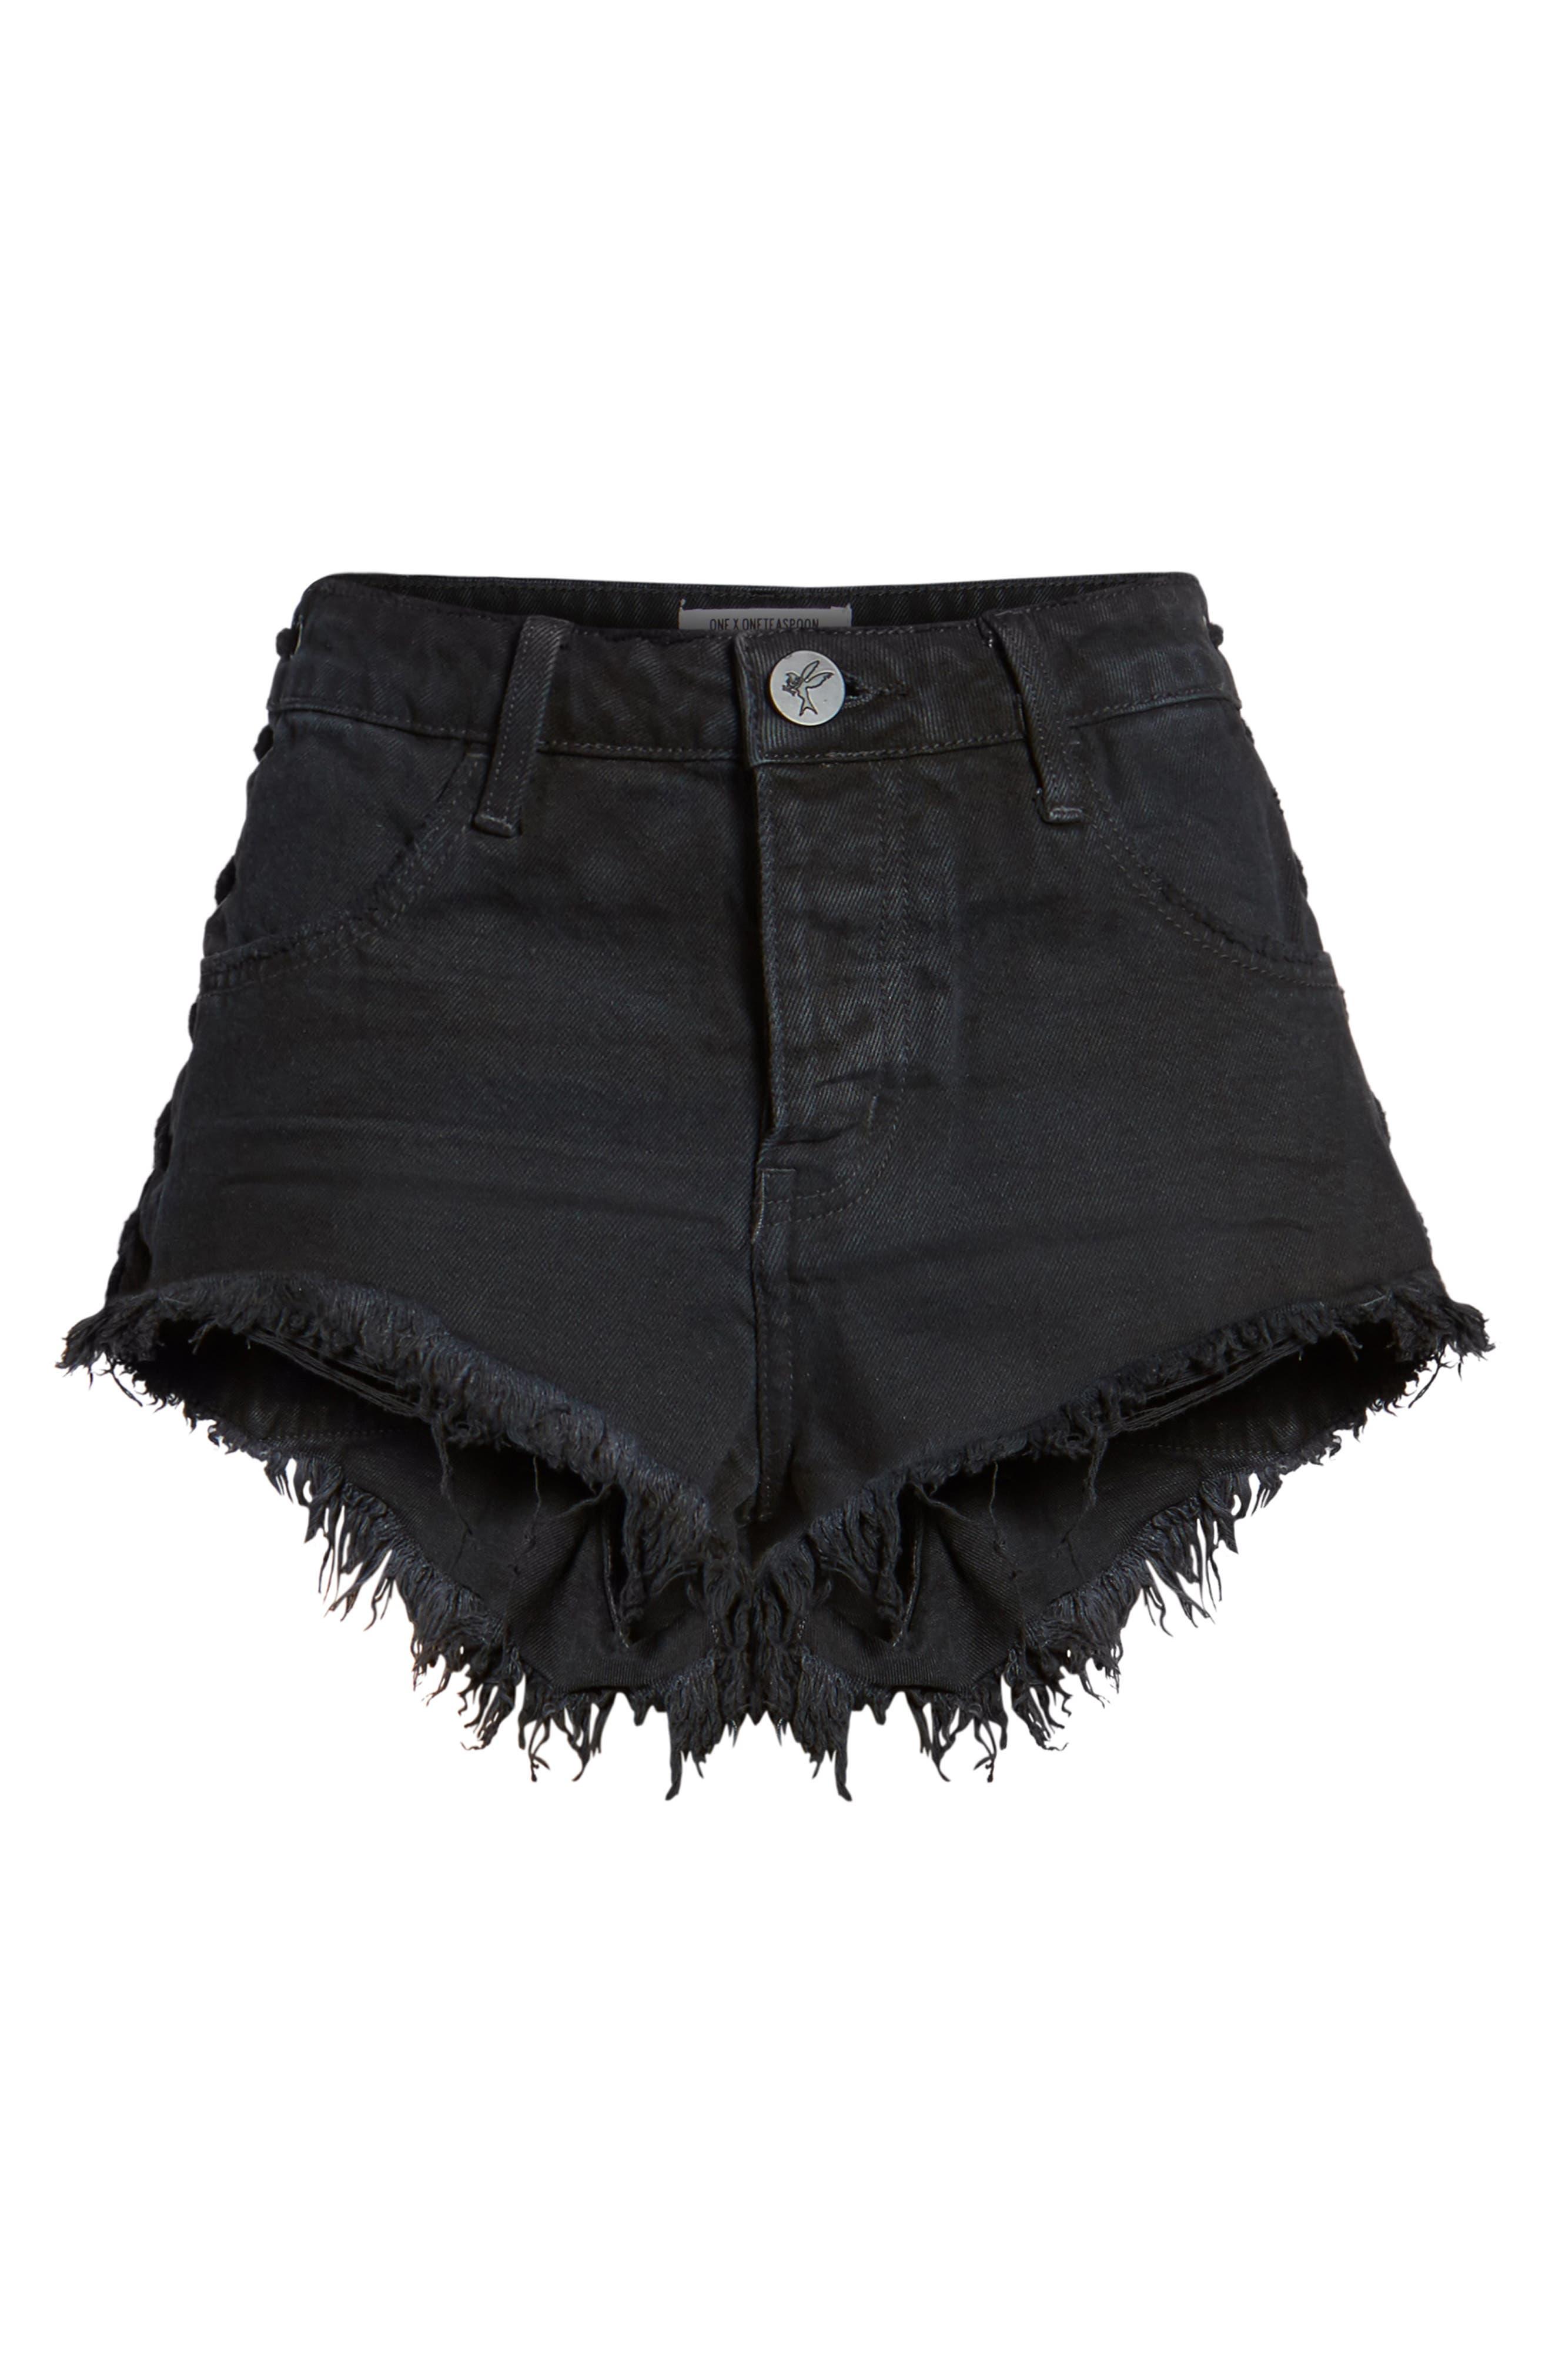 Brandos Relaxed Fit Cutoff Denim Shorts,                             Alternate thumbnail 6, color,